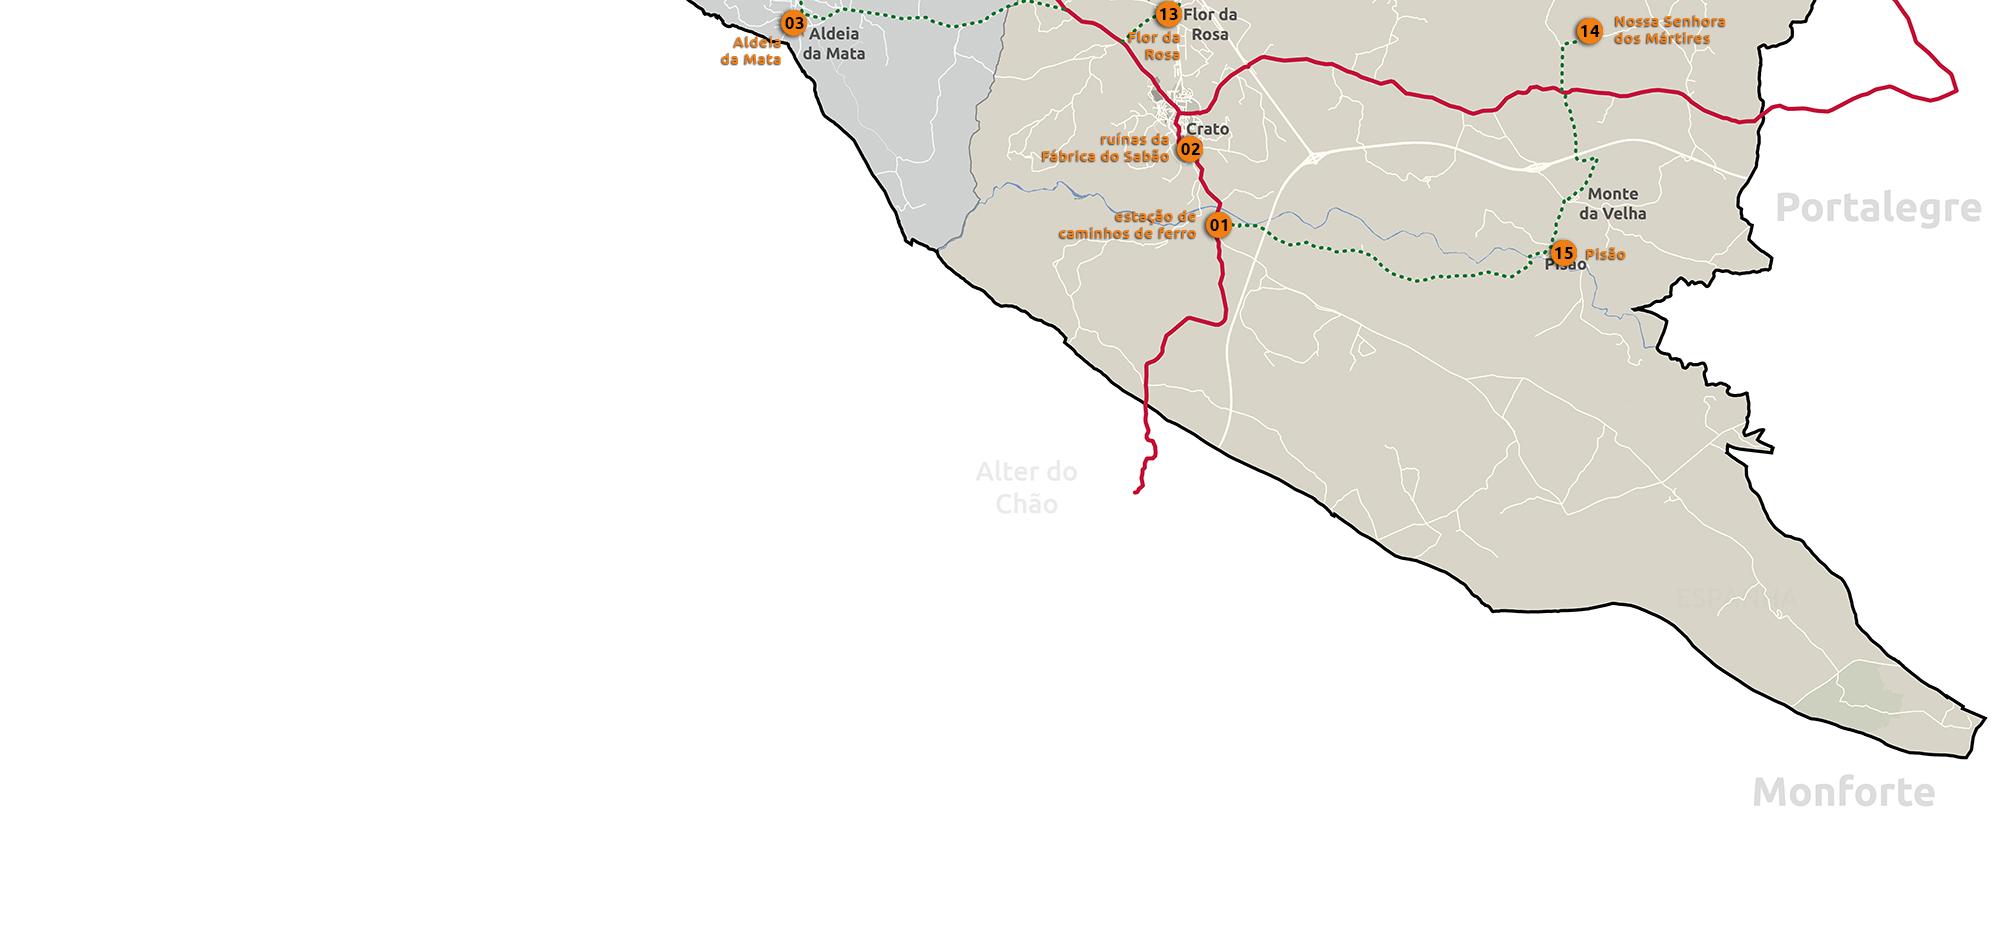 mapa_aumentado_2000x930_crato_141014-02